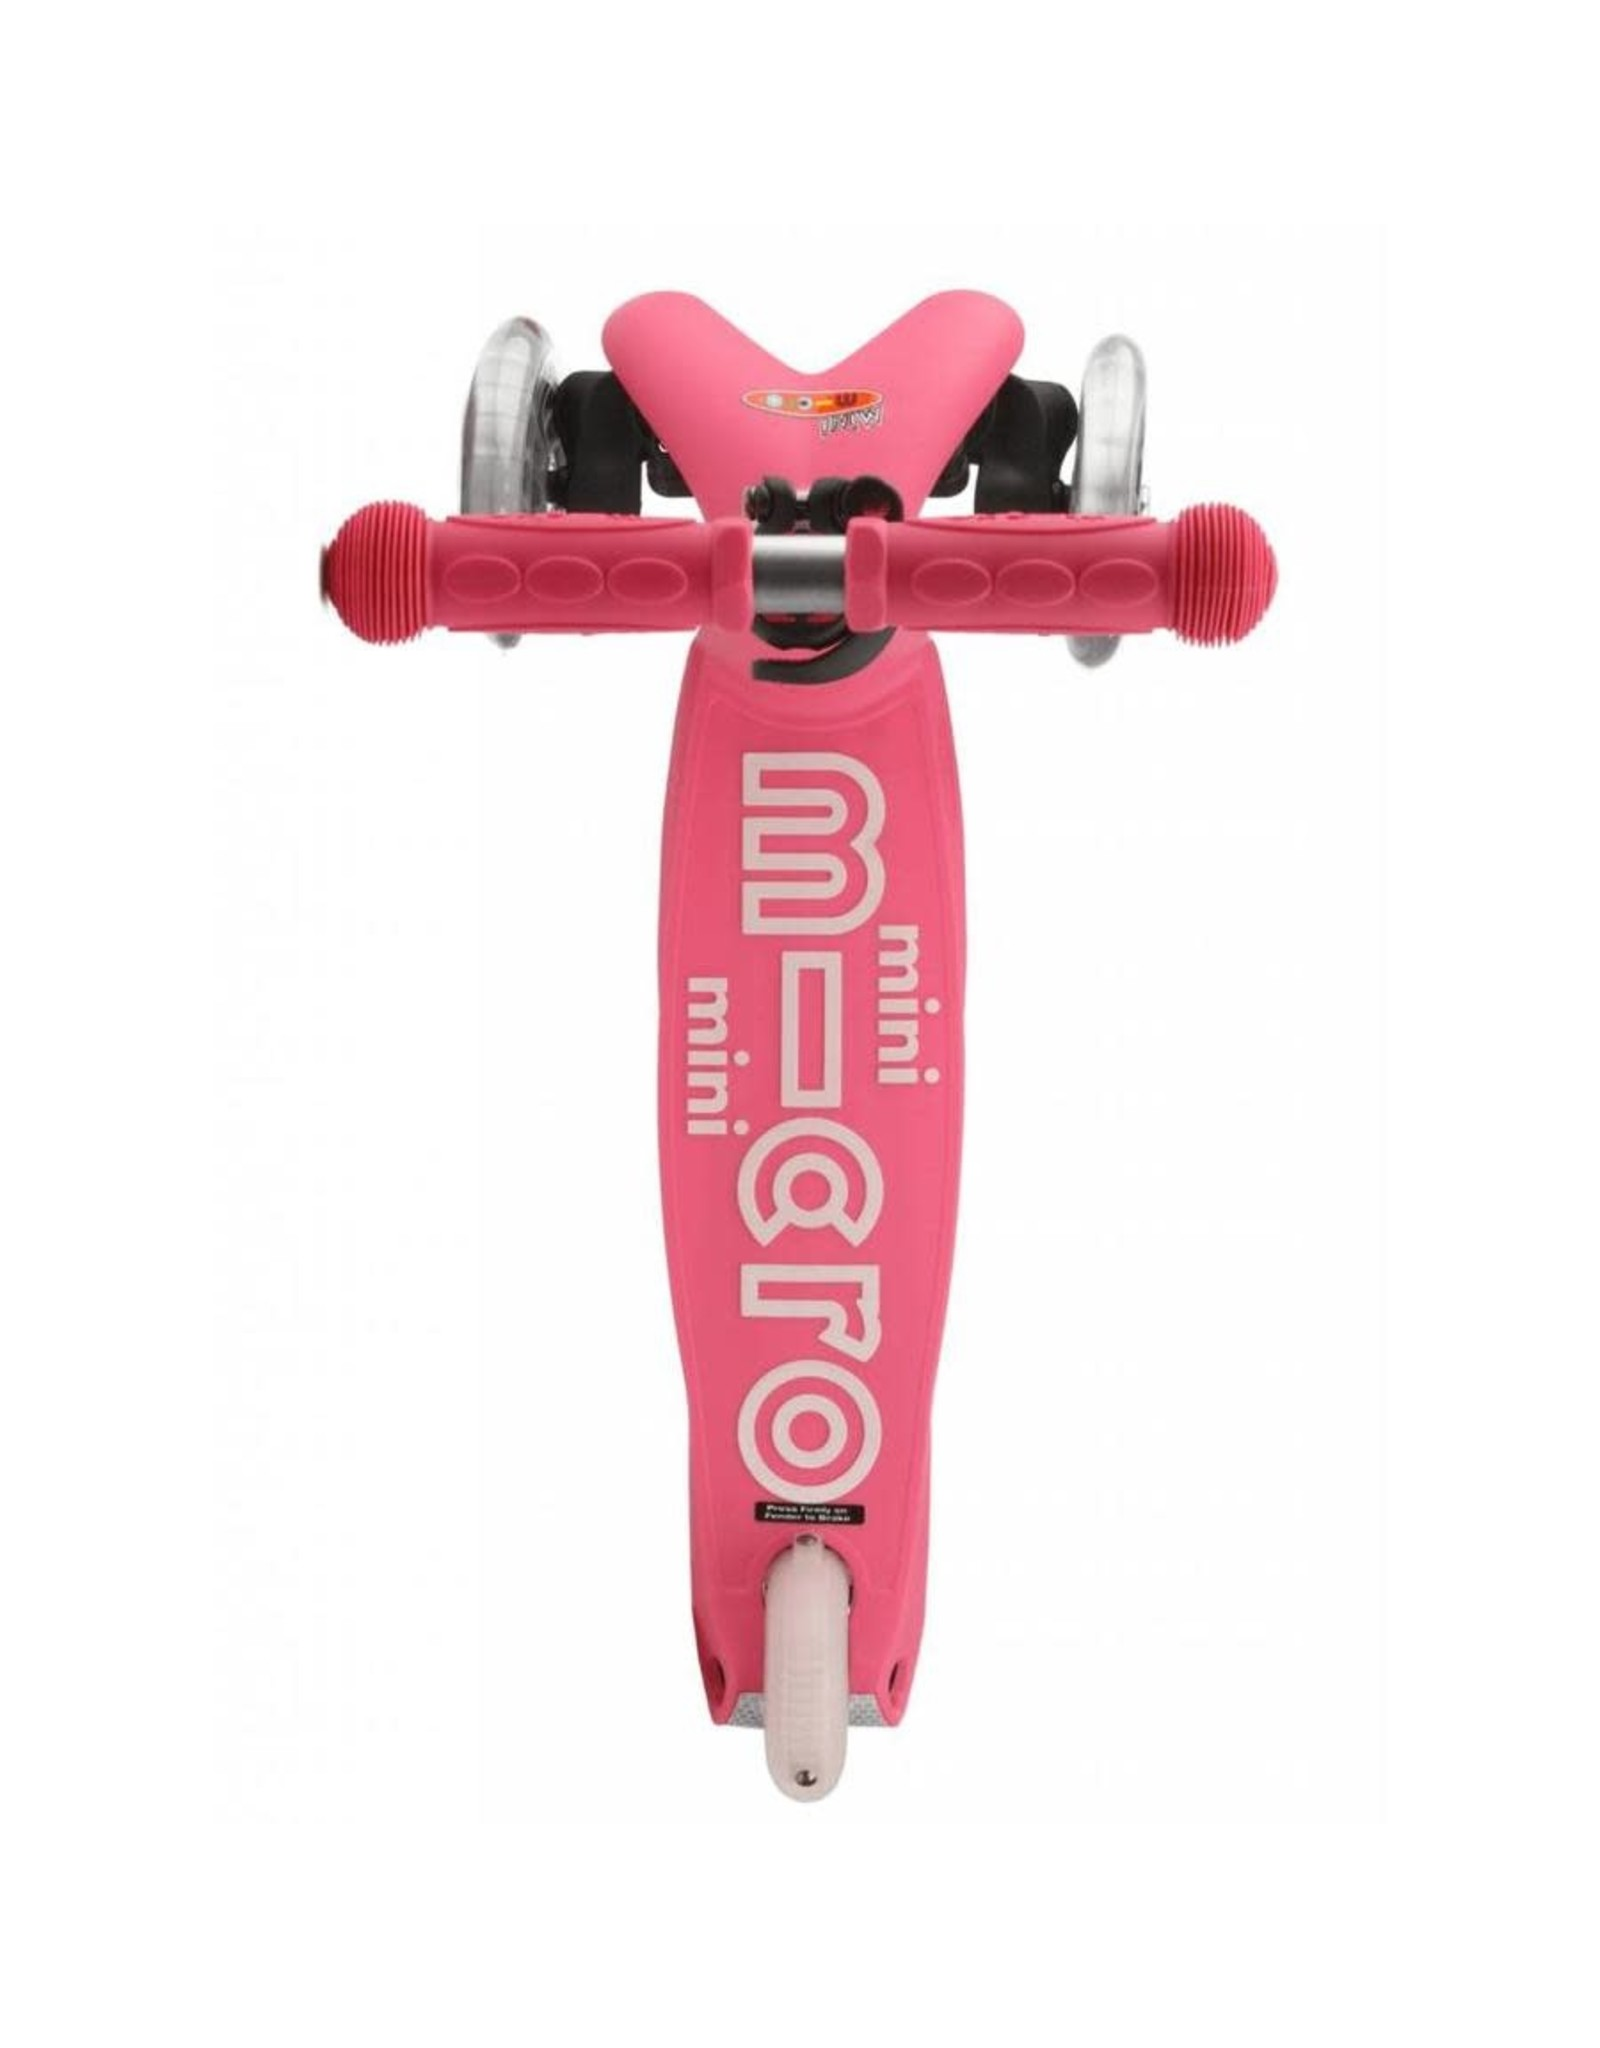 Microstep Mini Micro step deluxe roze - pre order